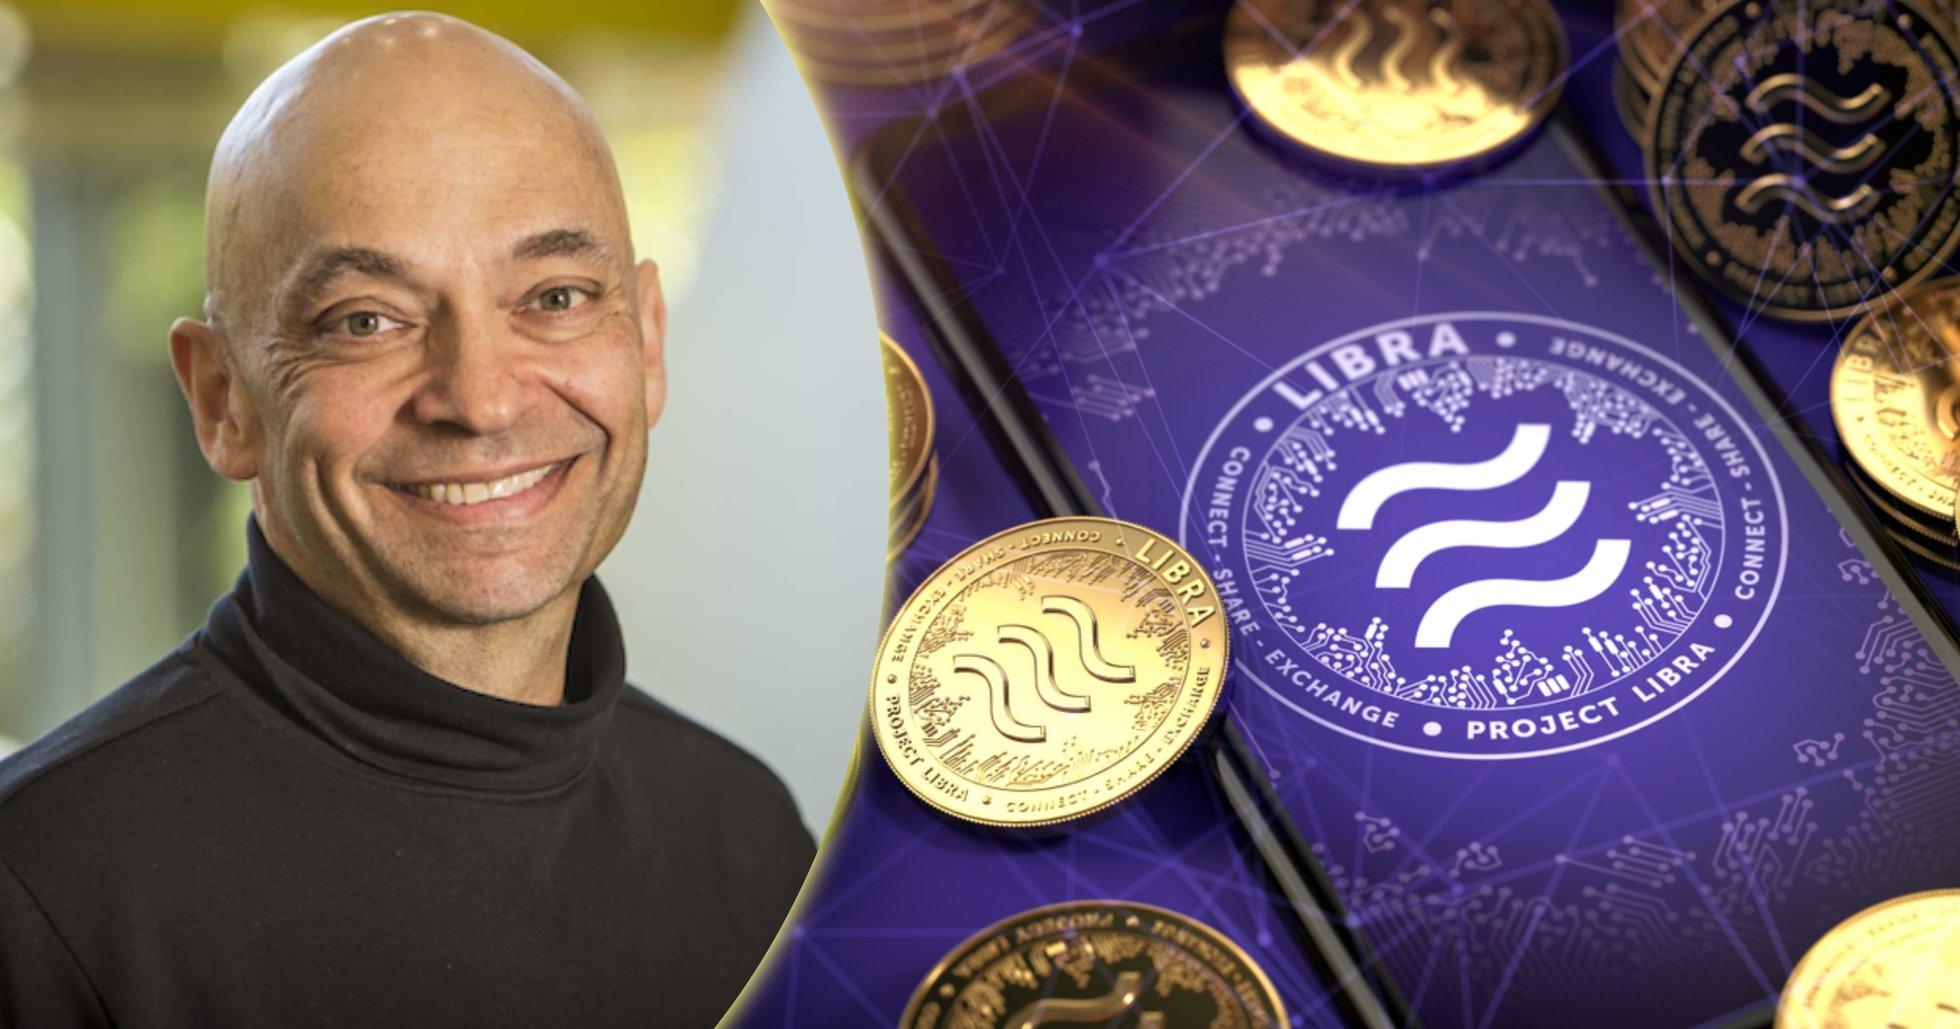 Ekonom: Facebooks libra kan fortfarande bli en bitcoindödare